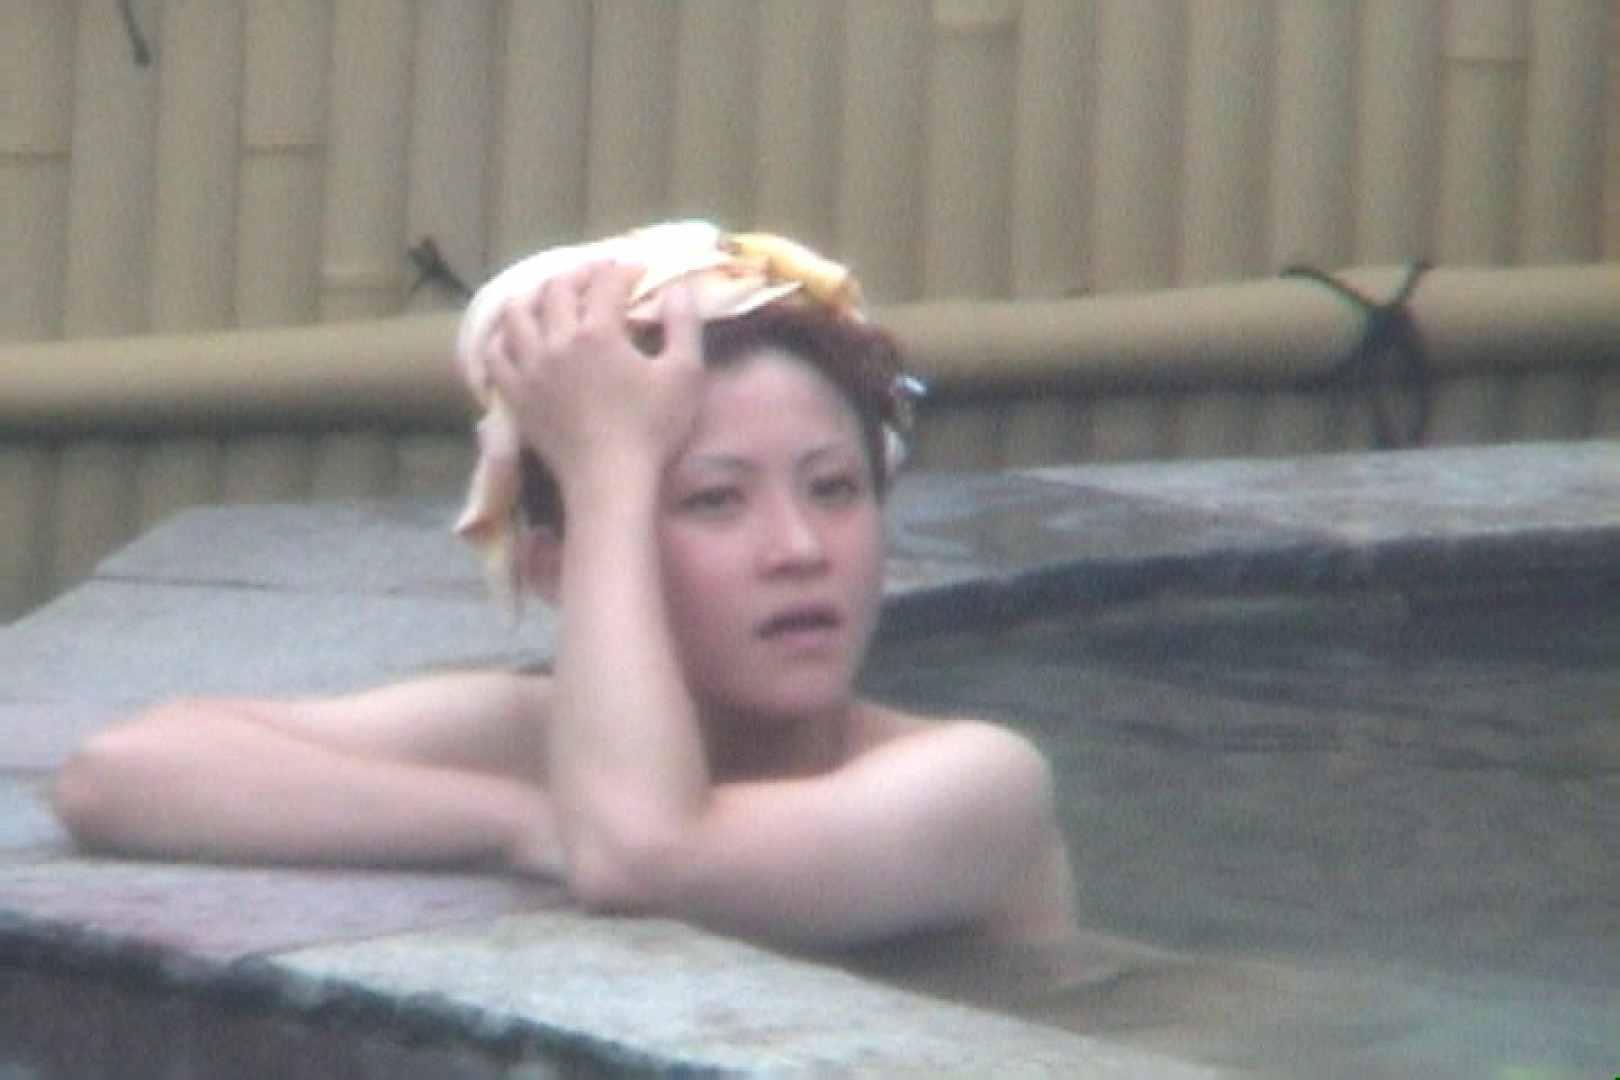 Aquaな露天風呂Vol.48【VIP限定】 OLのエロ生活   露天風呂  74連発 31